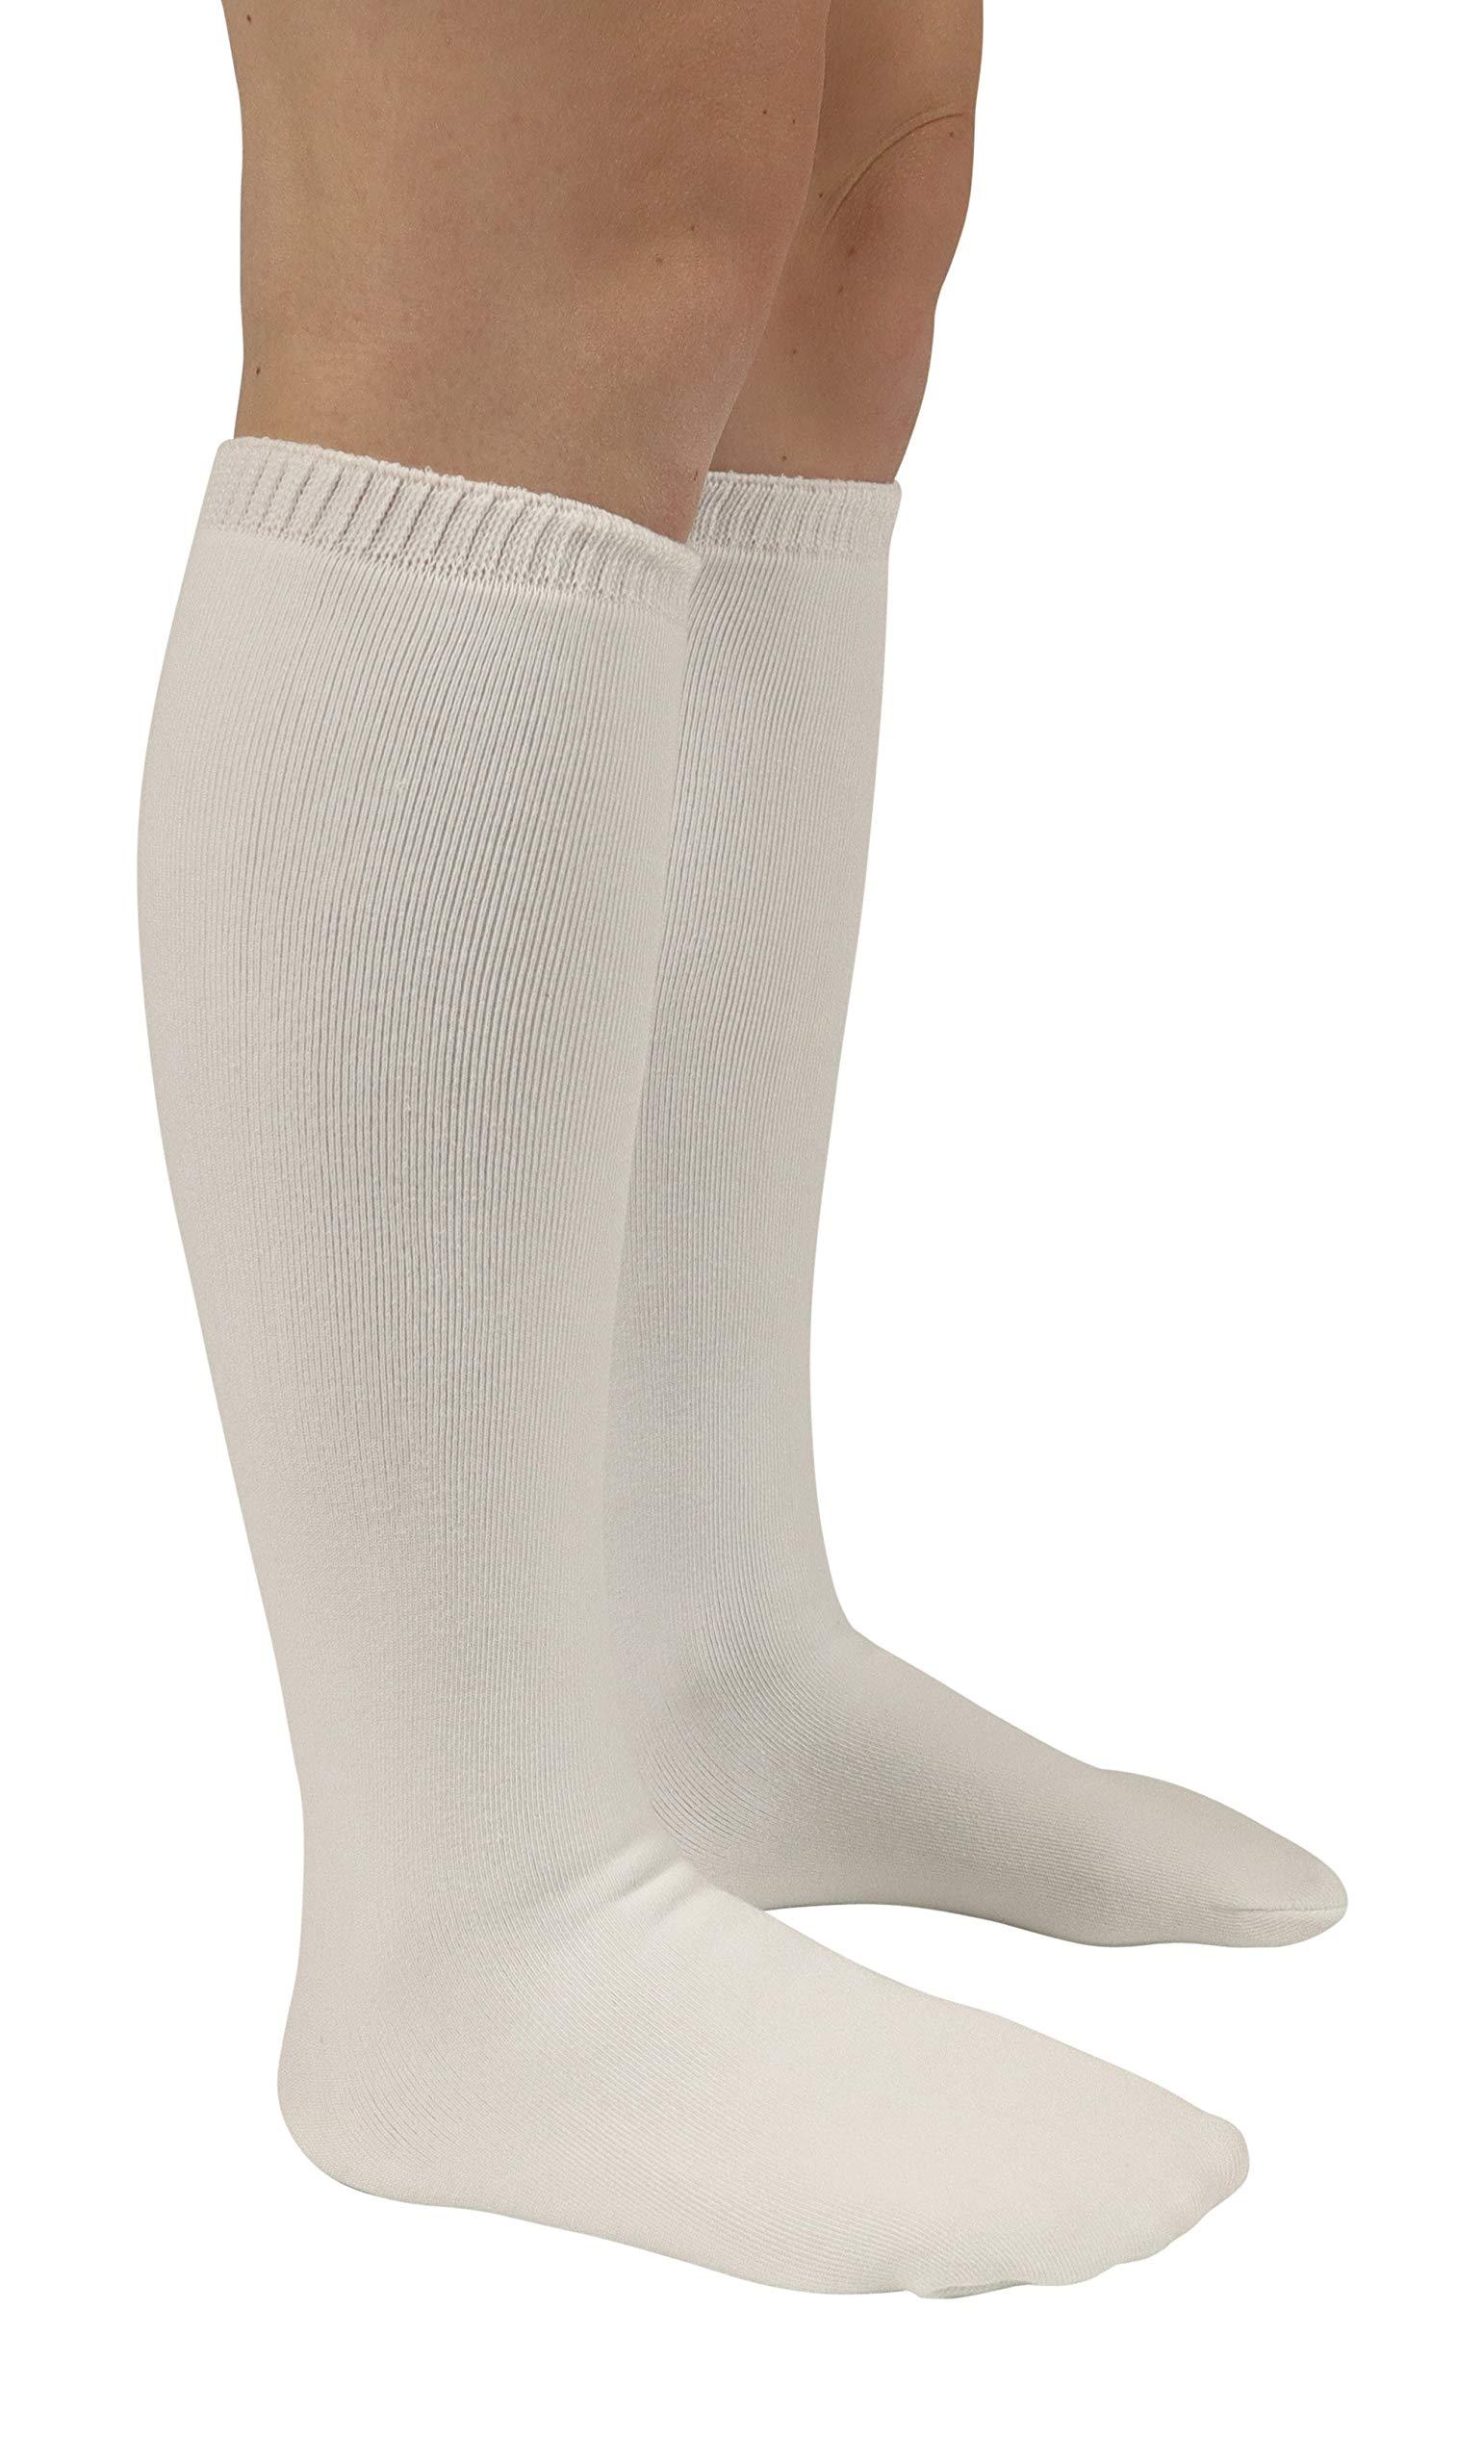 Amazon com: BraceAbility Replacement Sock Liner for